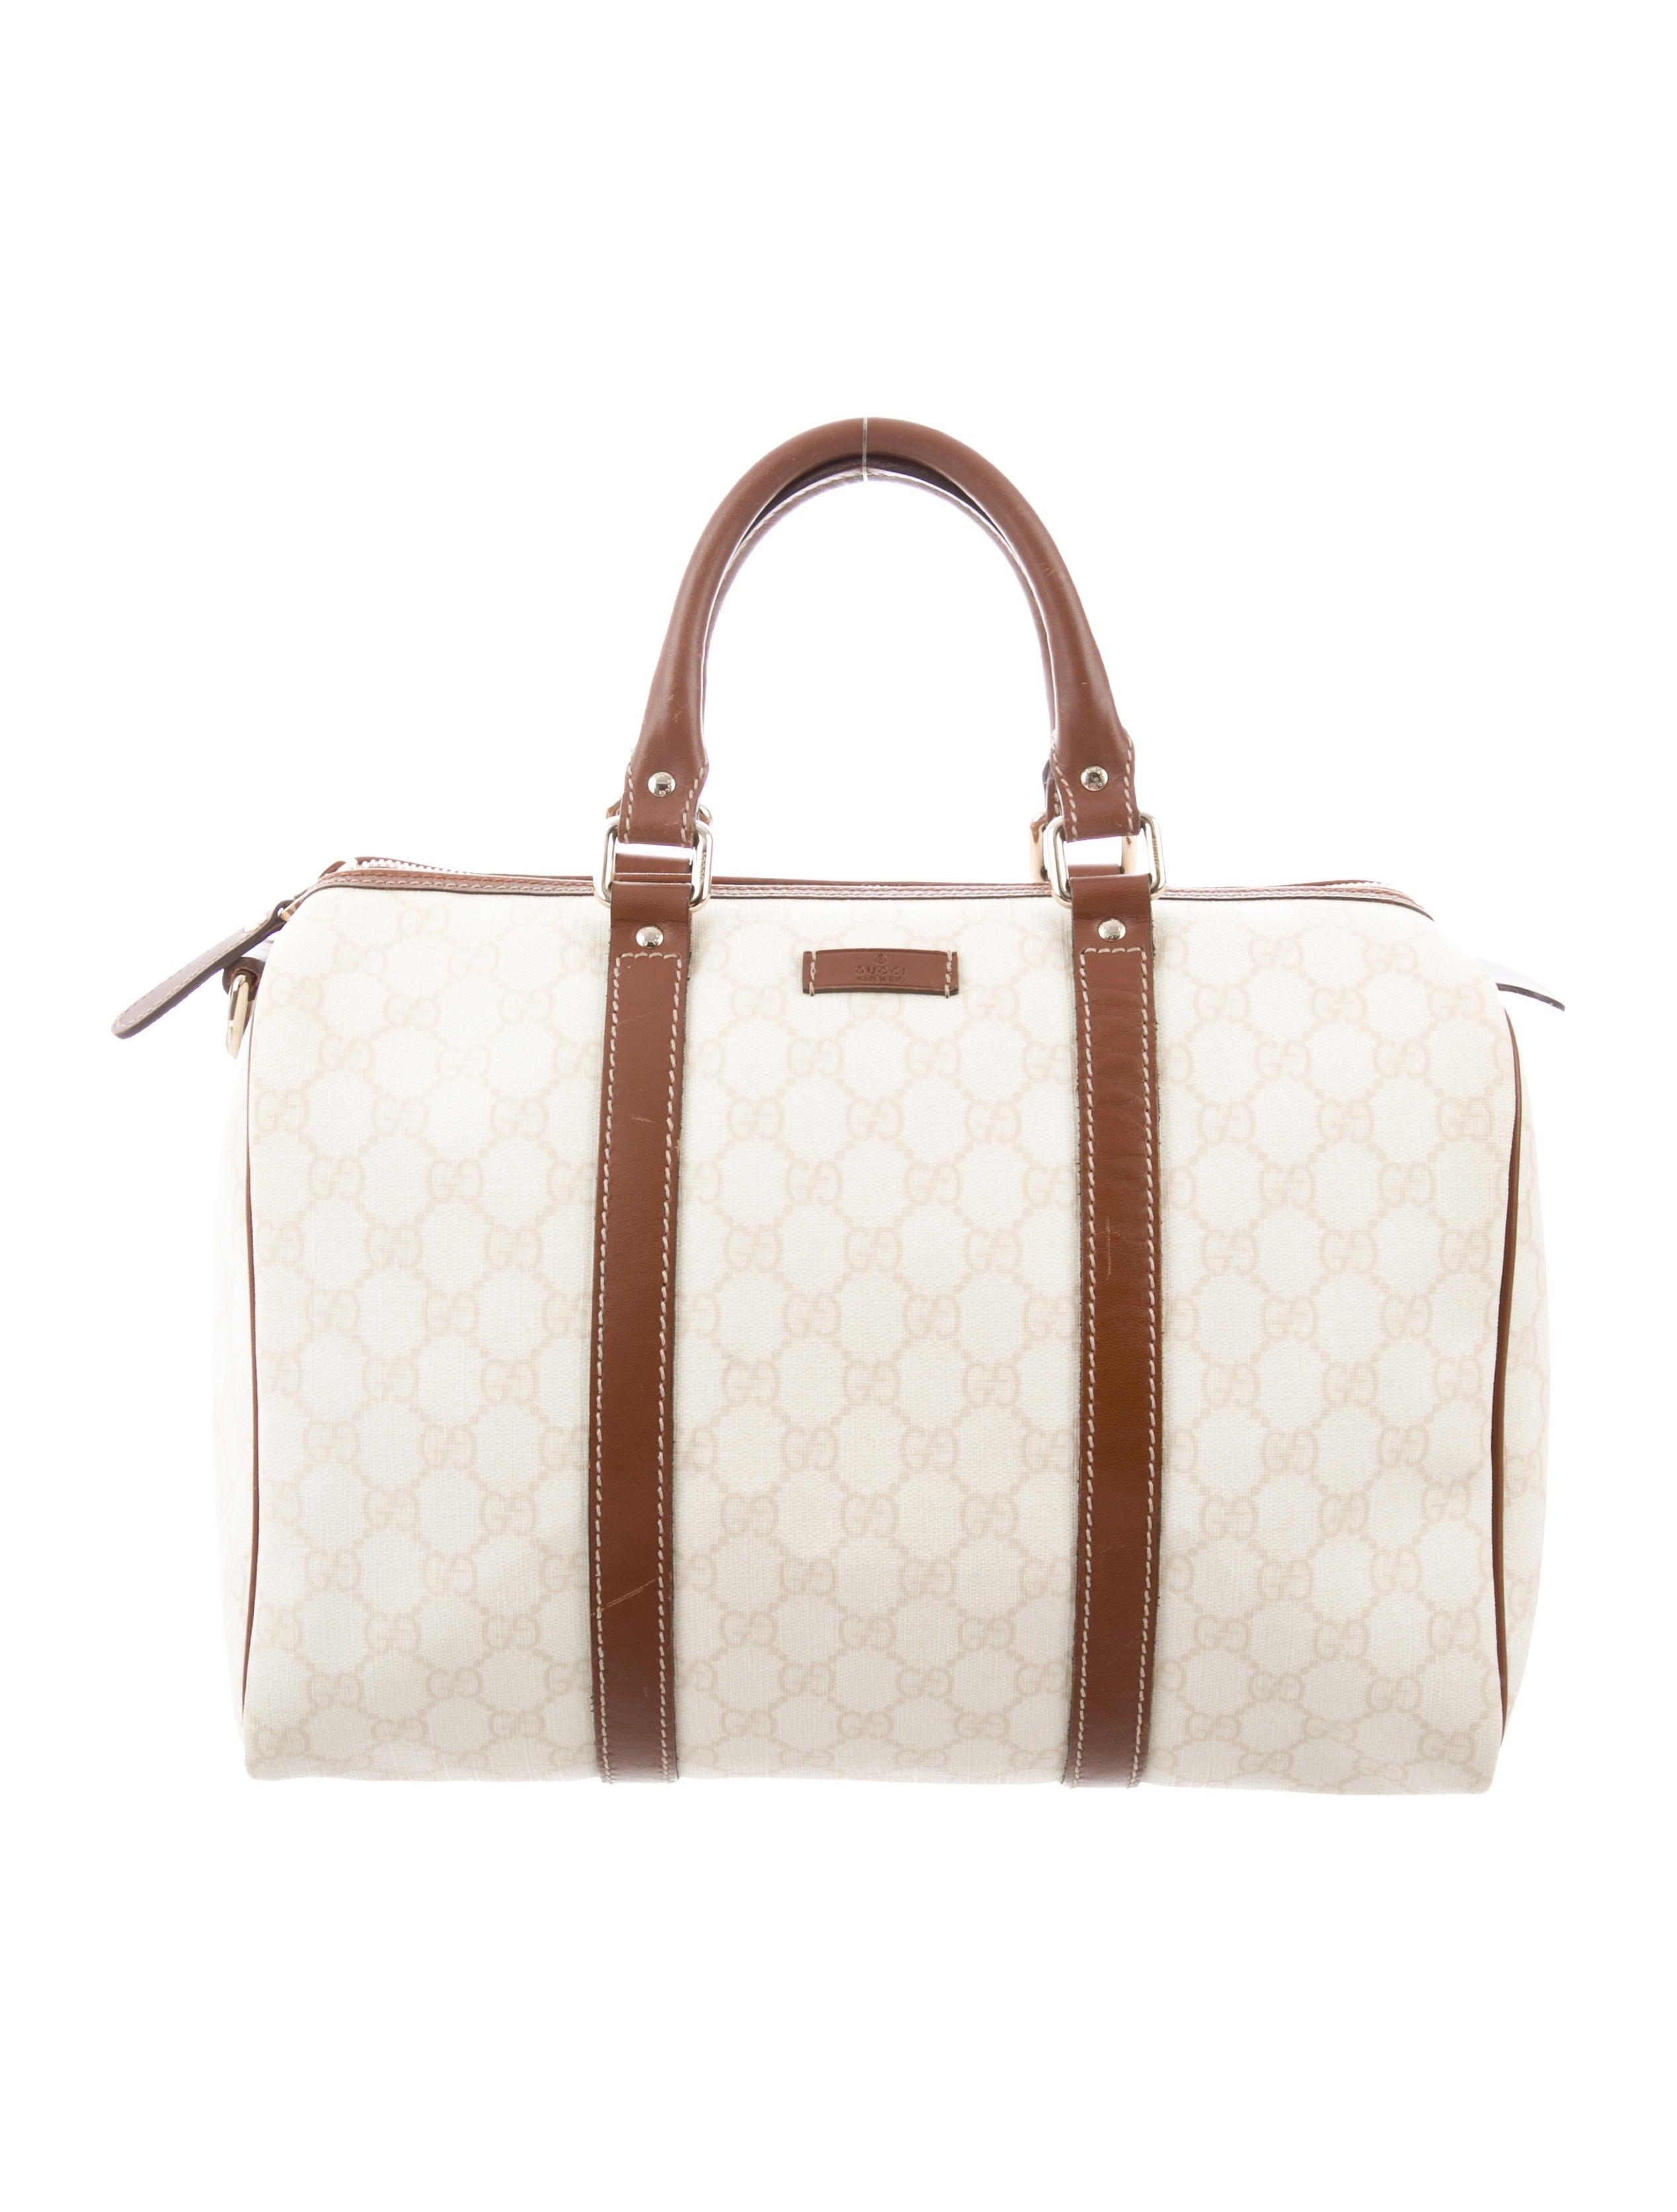 901843f35c4a7e Gucci GG Supreme Joy Boston Bag - Handbags - GUC247986 | The RealReal